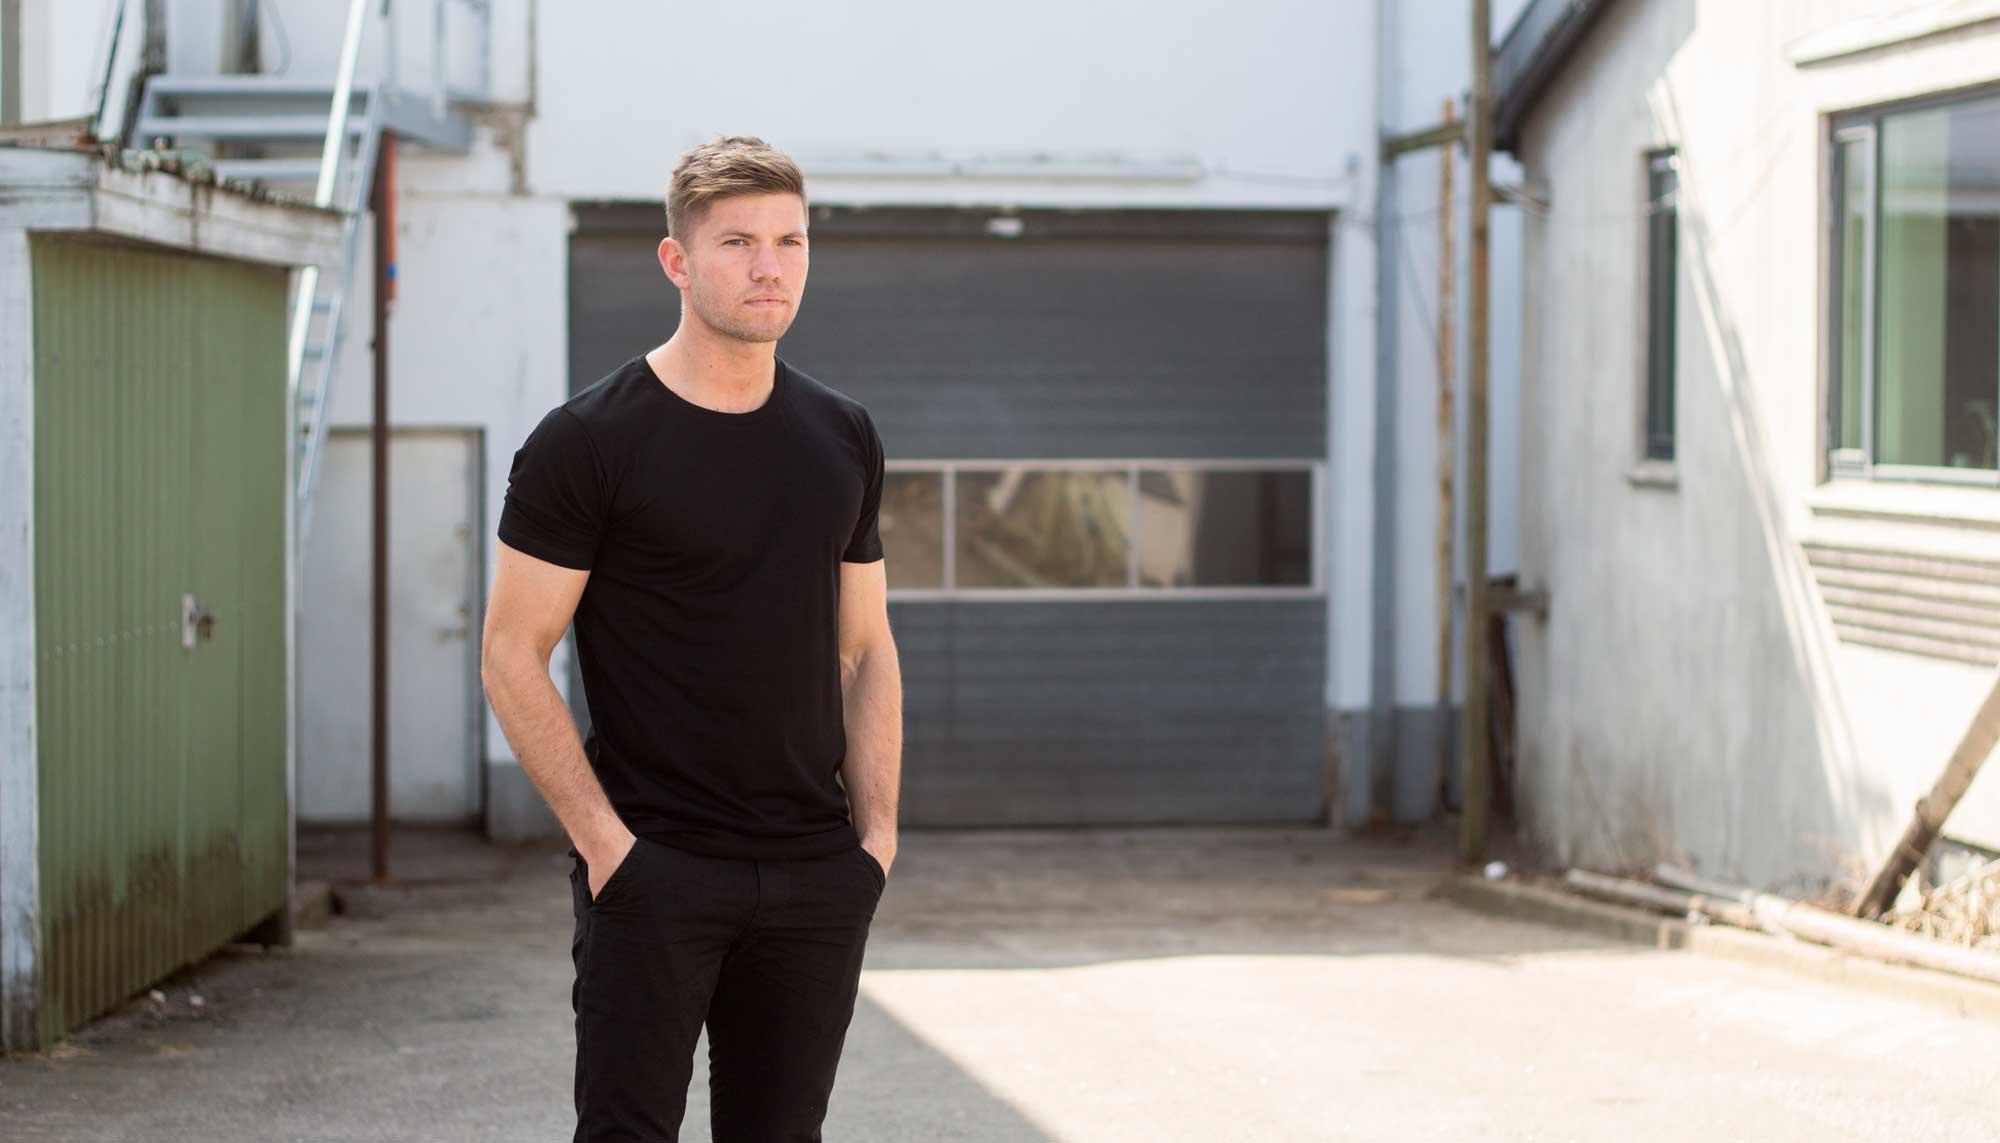 Passer perfekt: Aalborg-firma har ramt hele landet med nyt t-shirt koncept